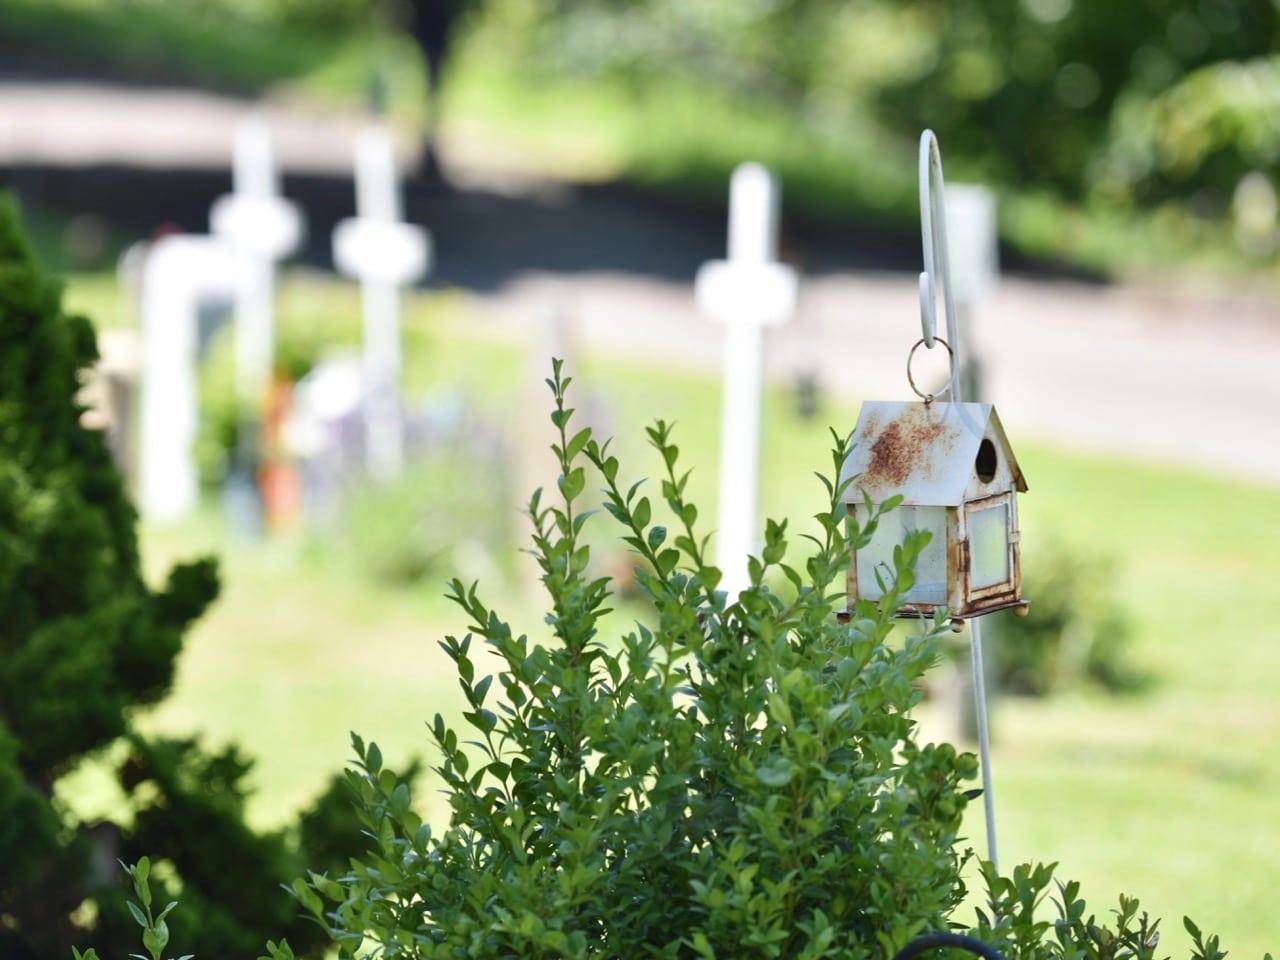 Tag des Friedhofs. Samstag, 17. September 2016 | Windlicht (Foto: Daniela Friedli)